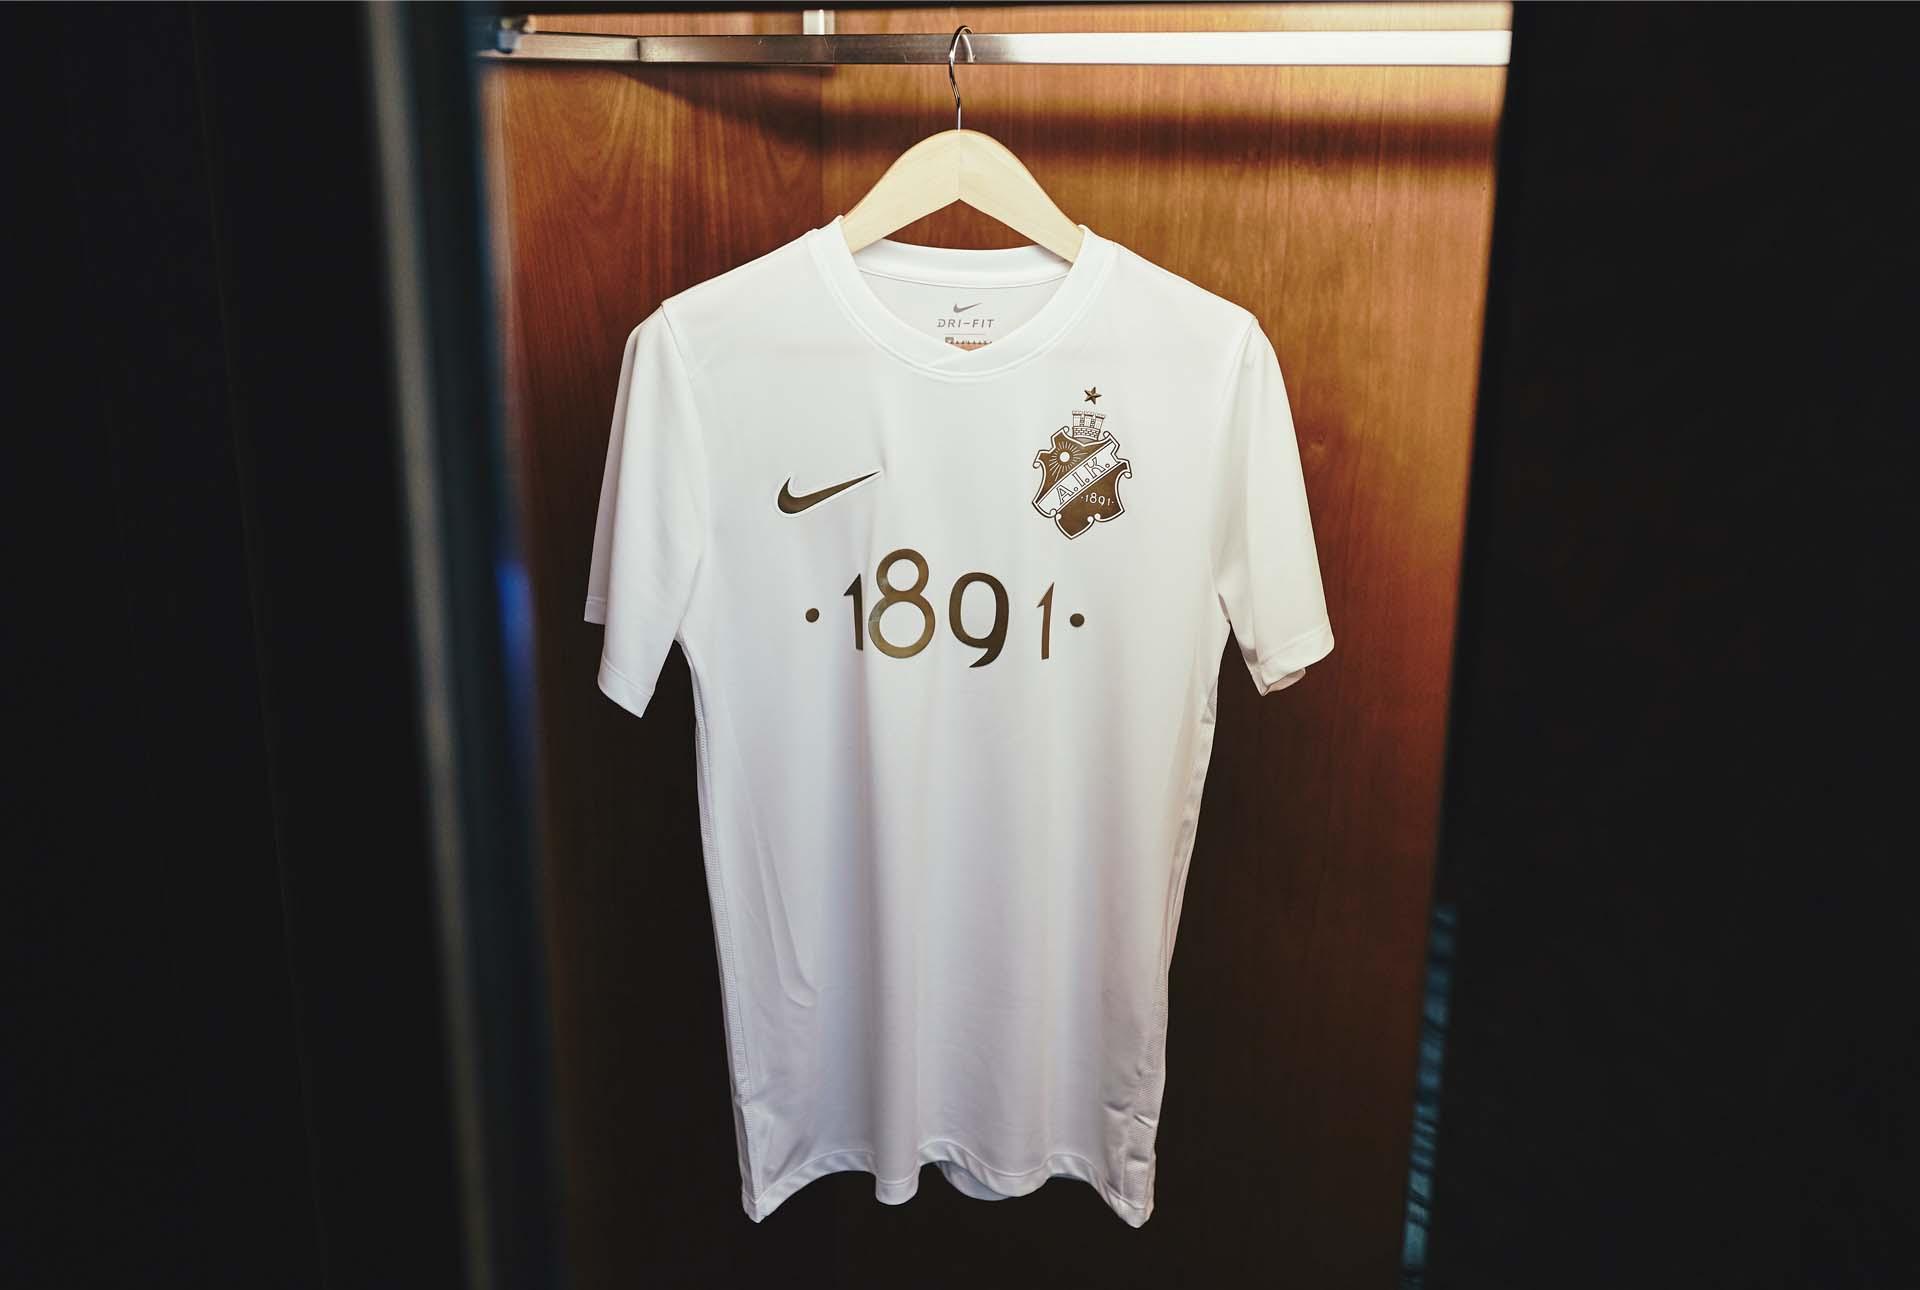 pretty nice e070d 45d54 Nike Launch Sublime AIK 1891 White Edition Jersey - SoccerBible